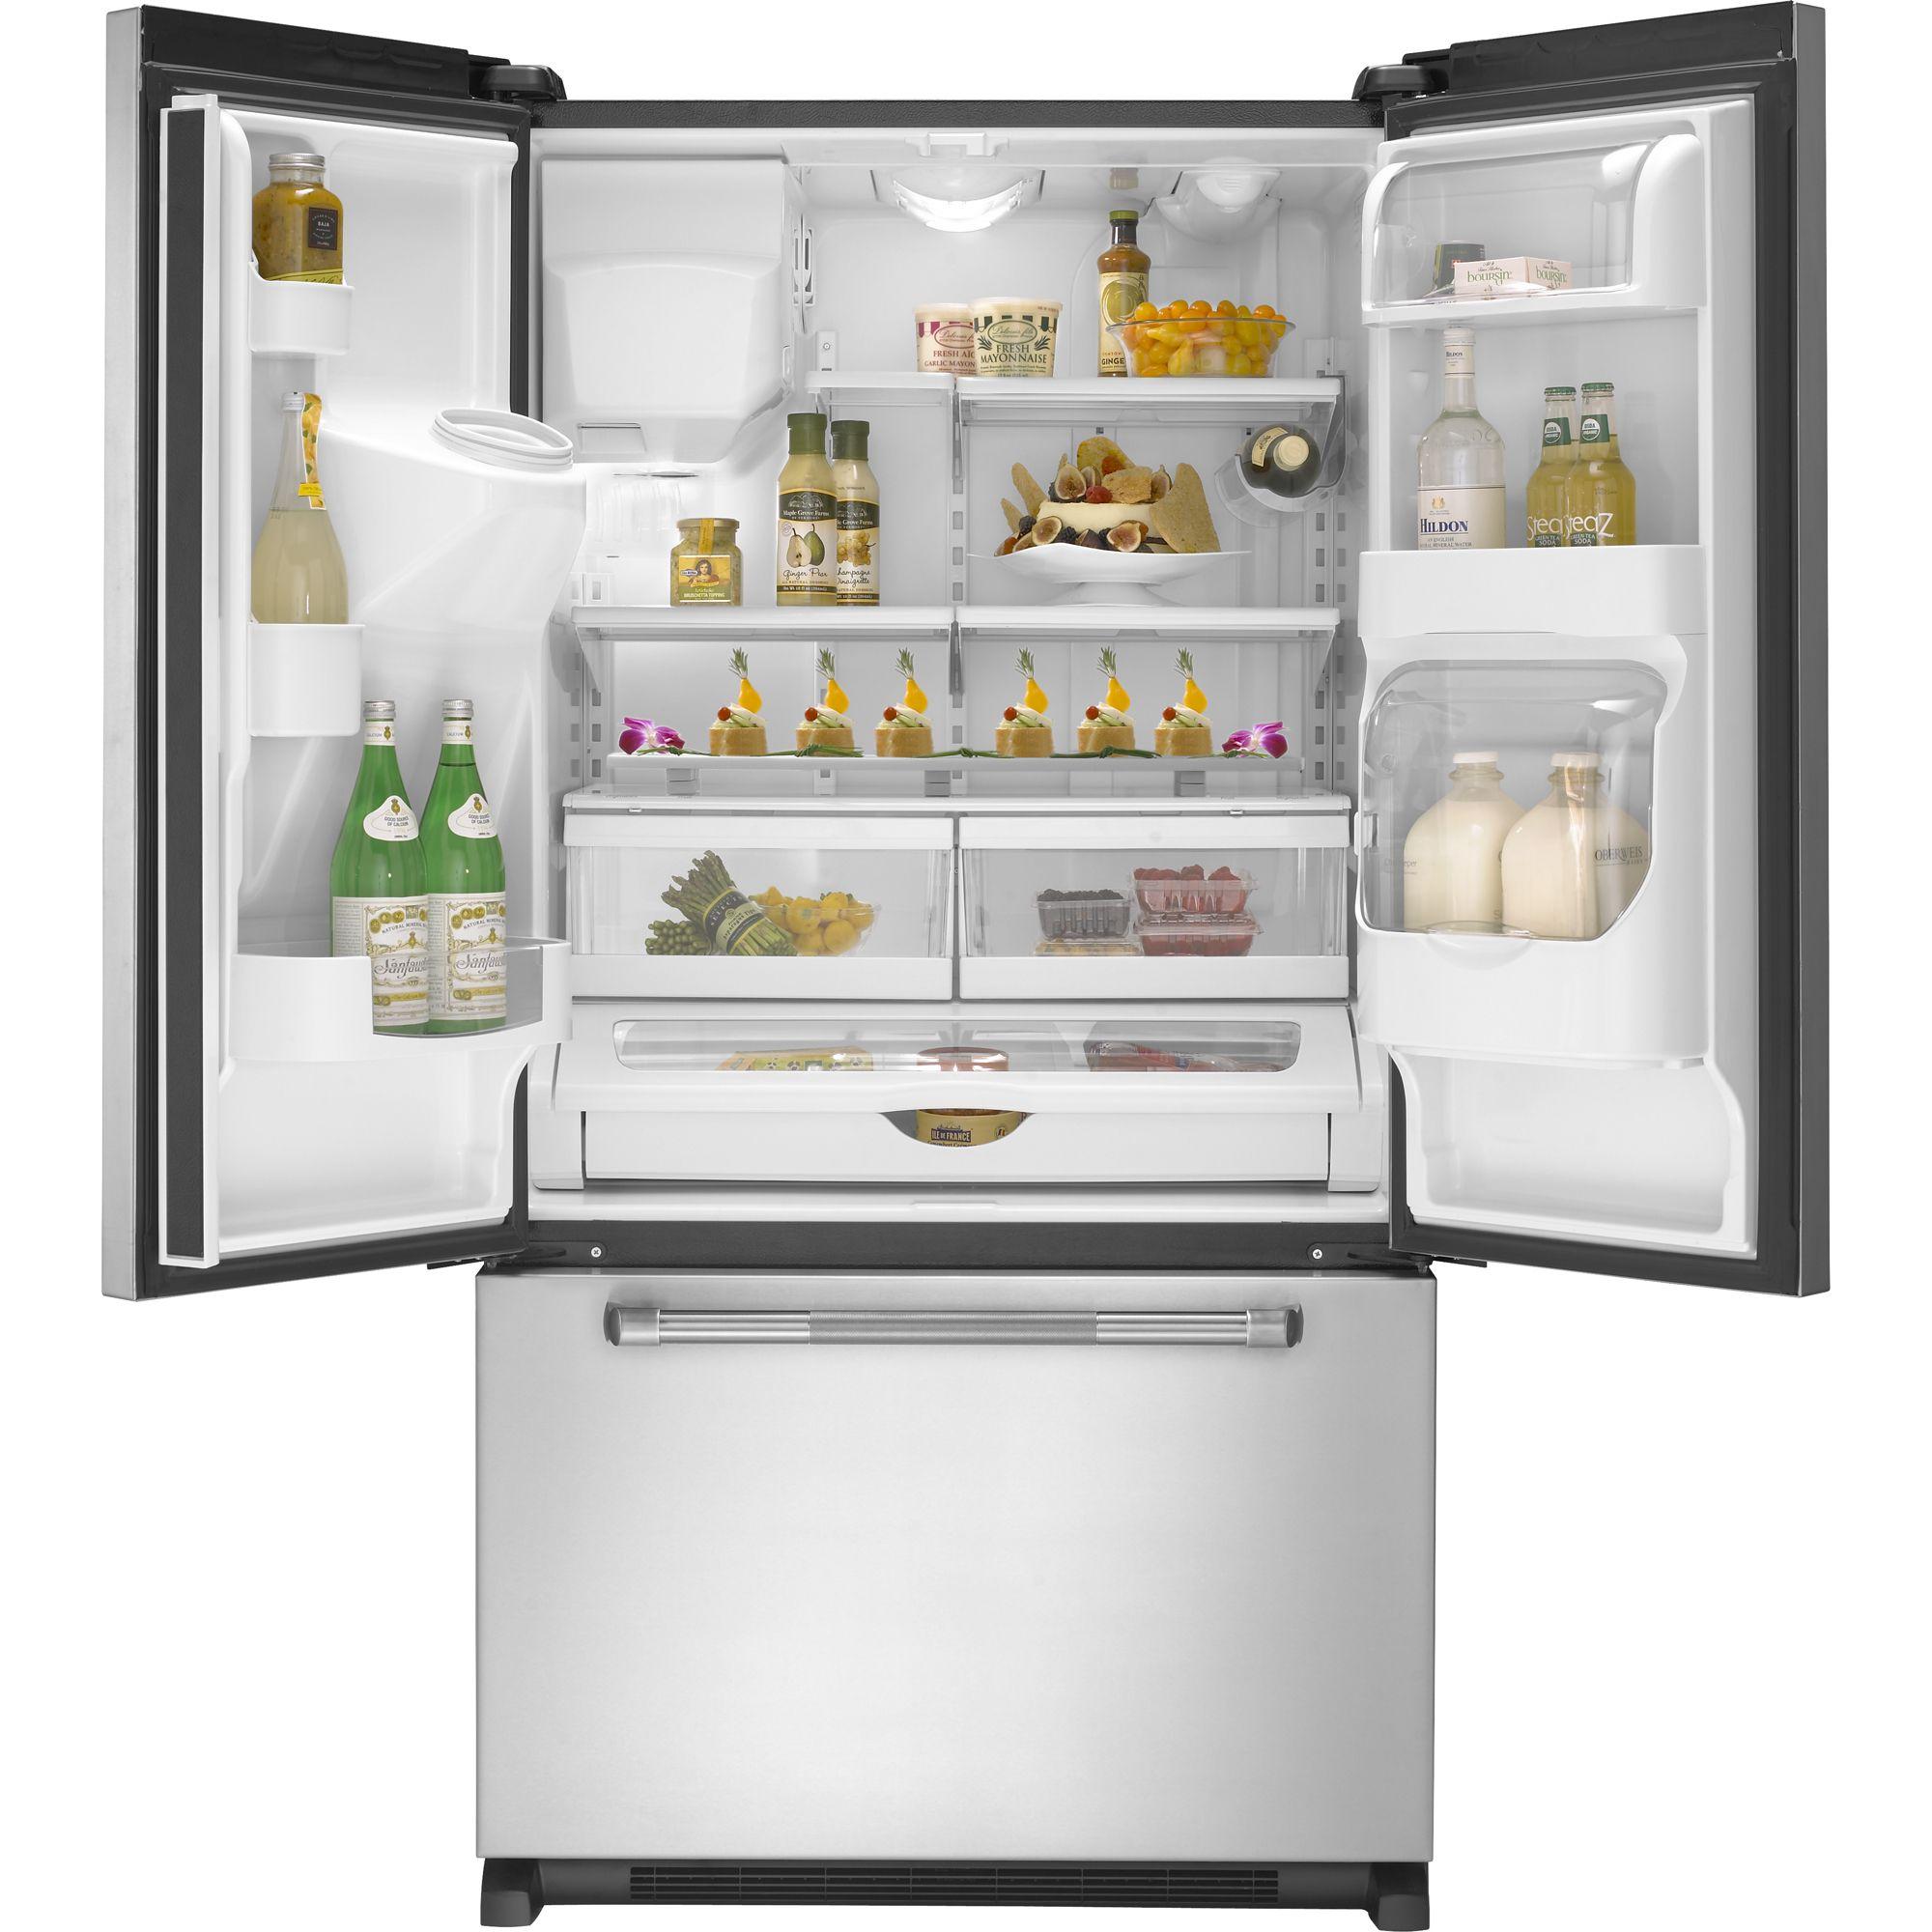 Jenn-Air 19.8 cu. ft. Pro-Style® French-Door Refrigerator w/ External Dispenser